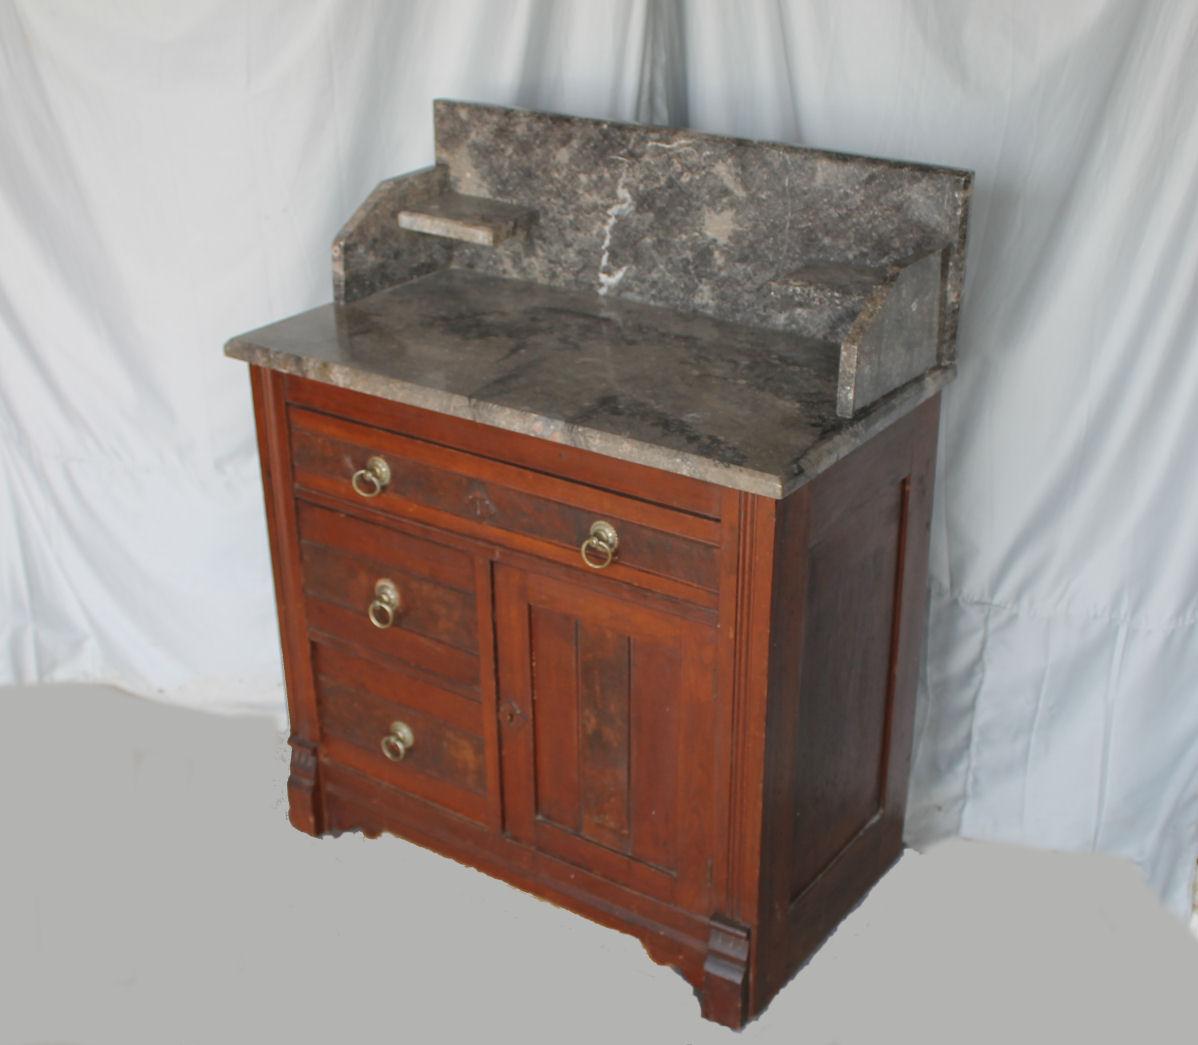 Charm Bargain S Victorian Walnut Eastlake Marble Wash Wash Stand Repurposed Wash Stand Uk houzz 01 Antique Wash Stand